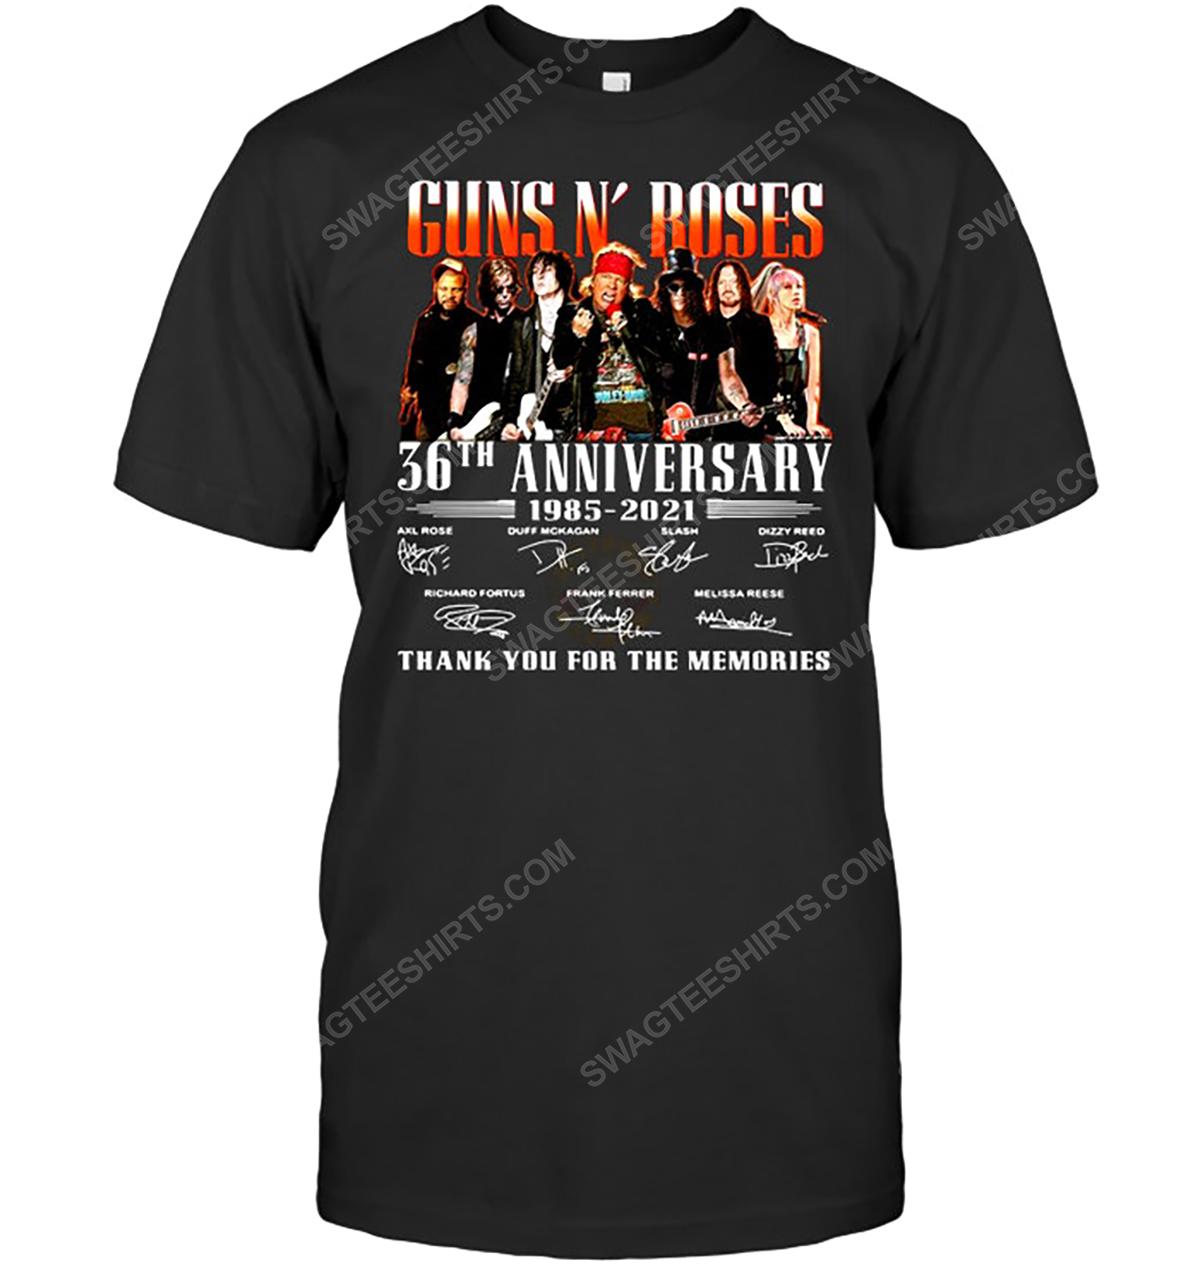 Guns n roses 35th anniversary thank you for memories tshirt 1